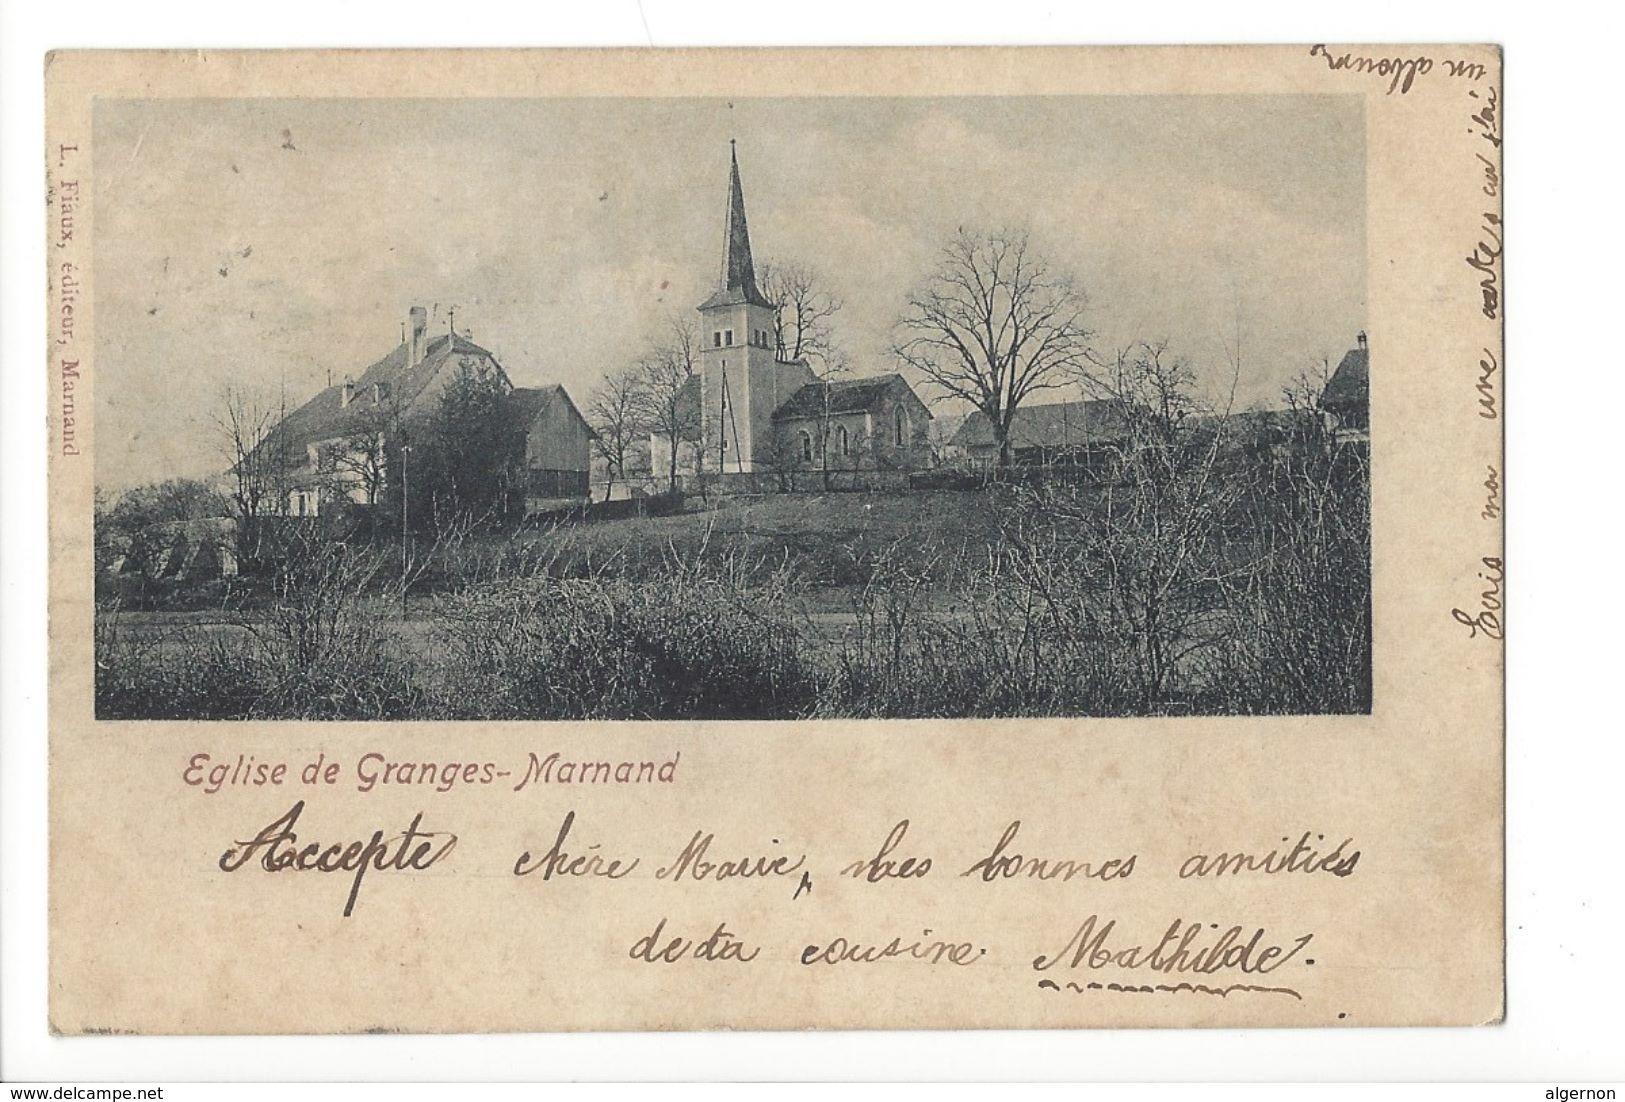 17242 - Eglise De Granges-Marnand - VD Vaud